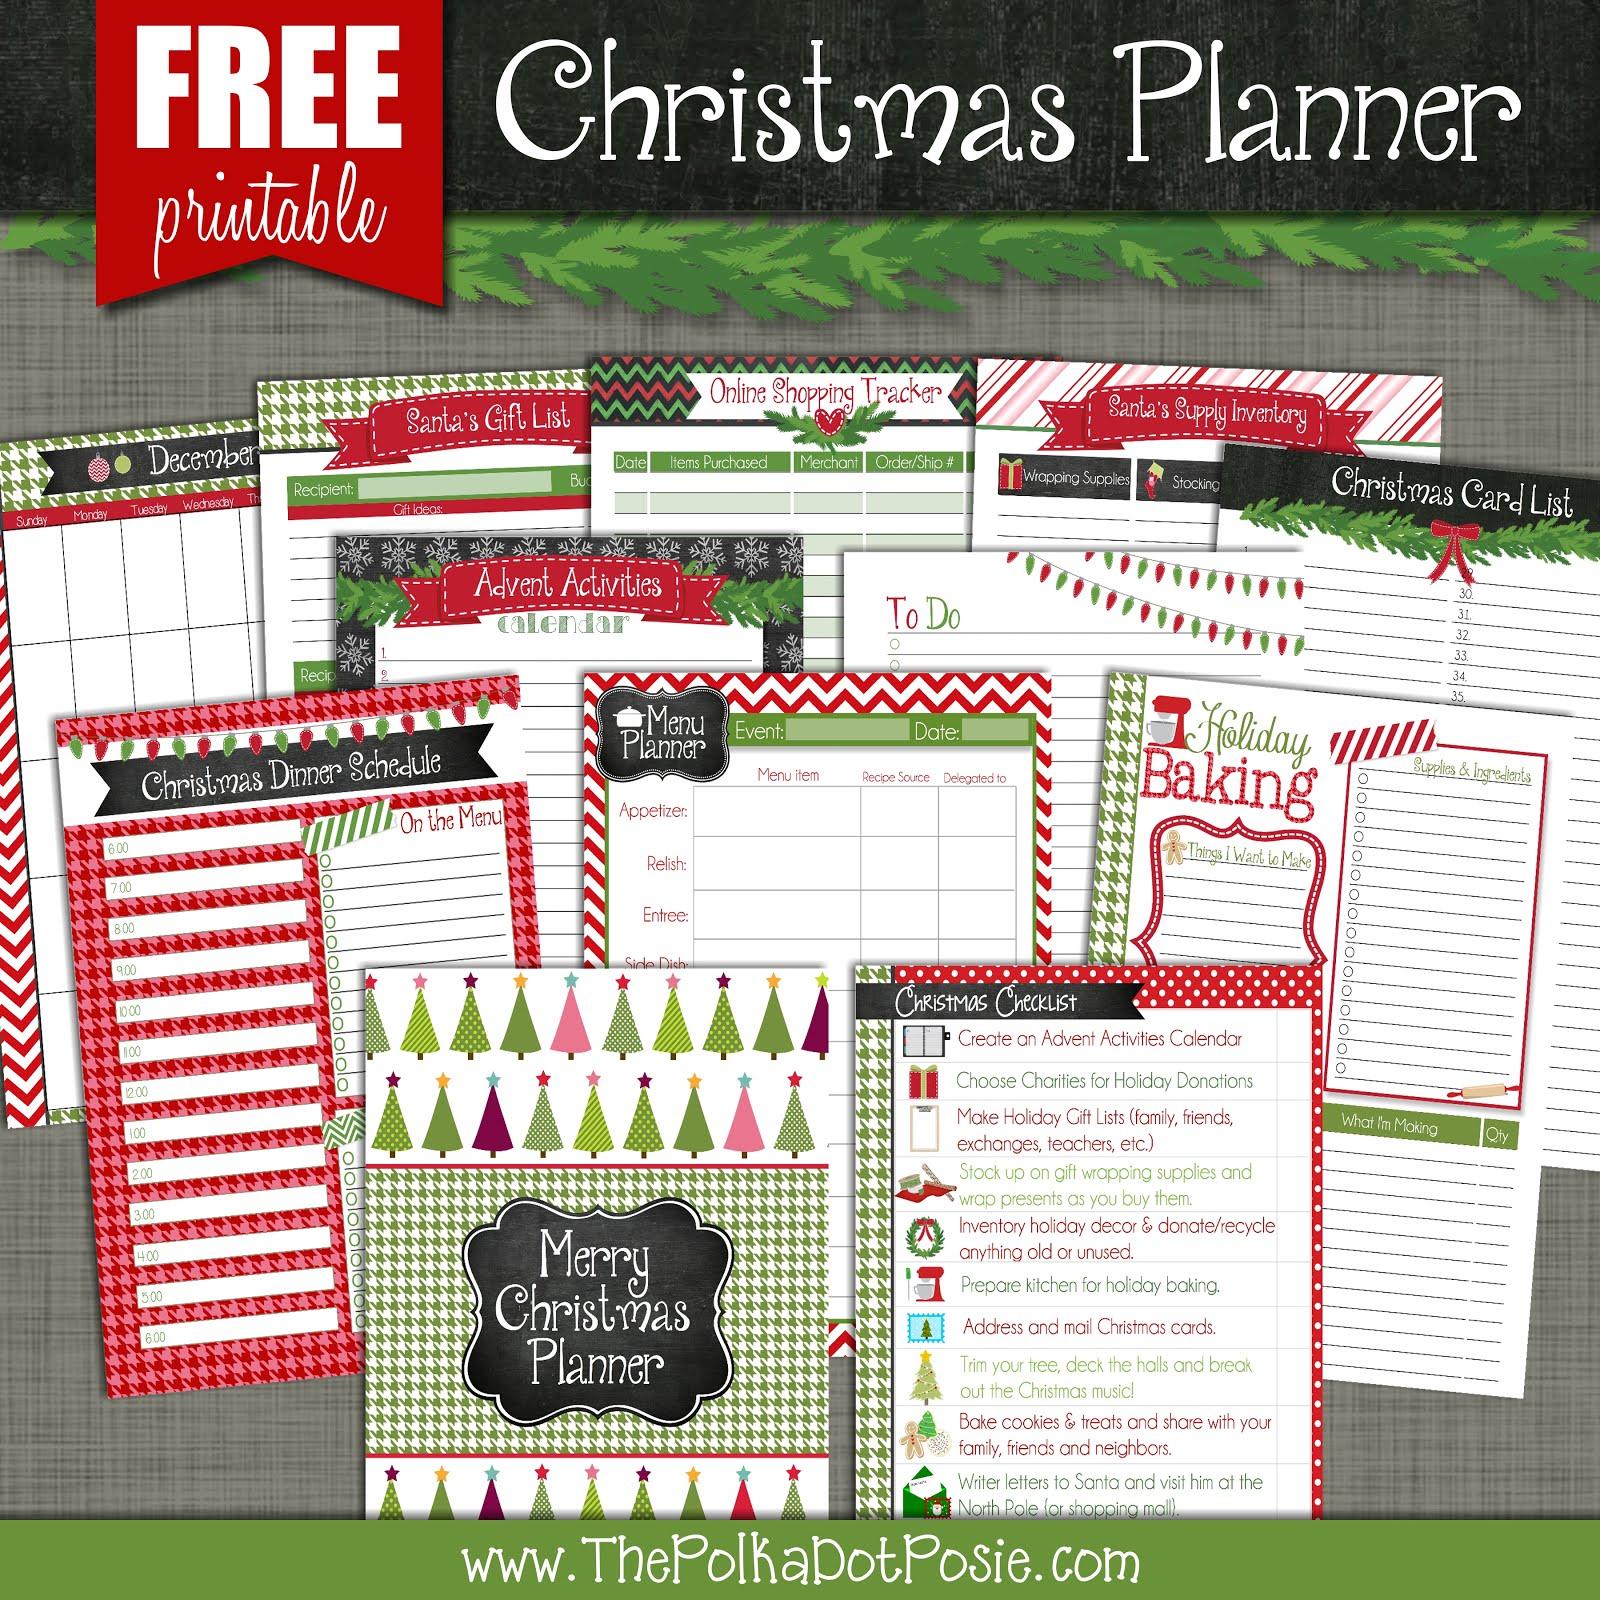 The Polka Dot Posie Free Christmas Shopping Checklist